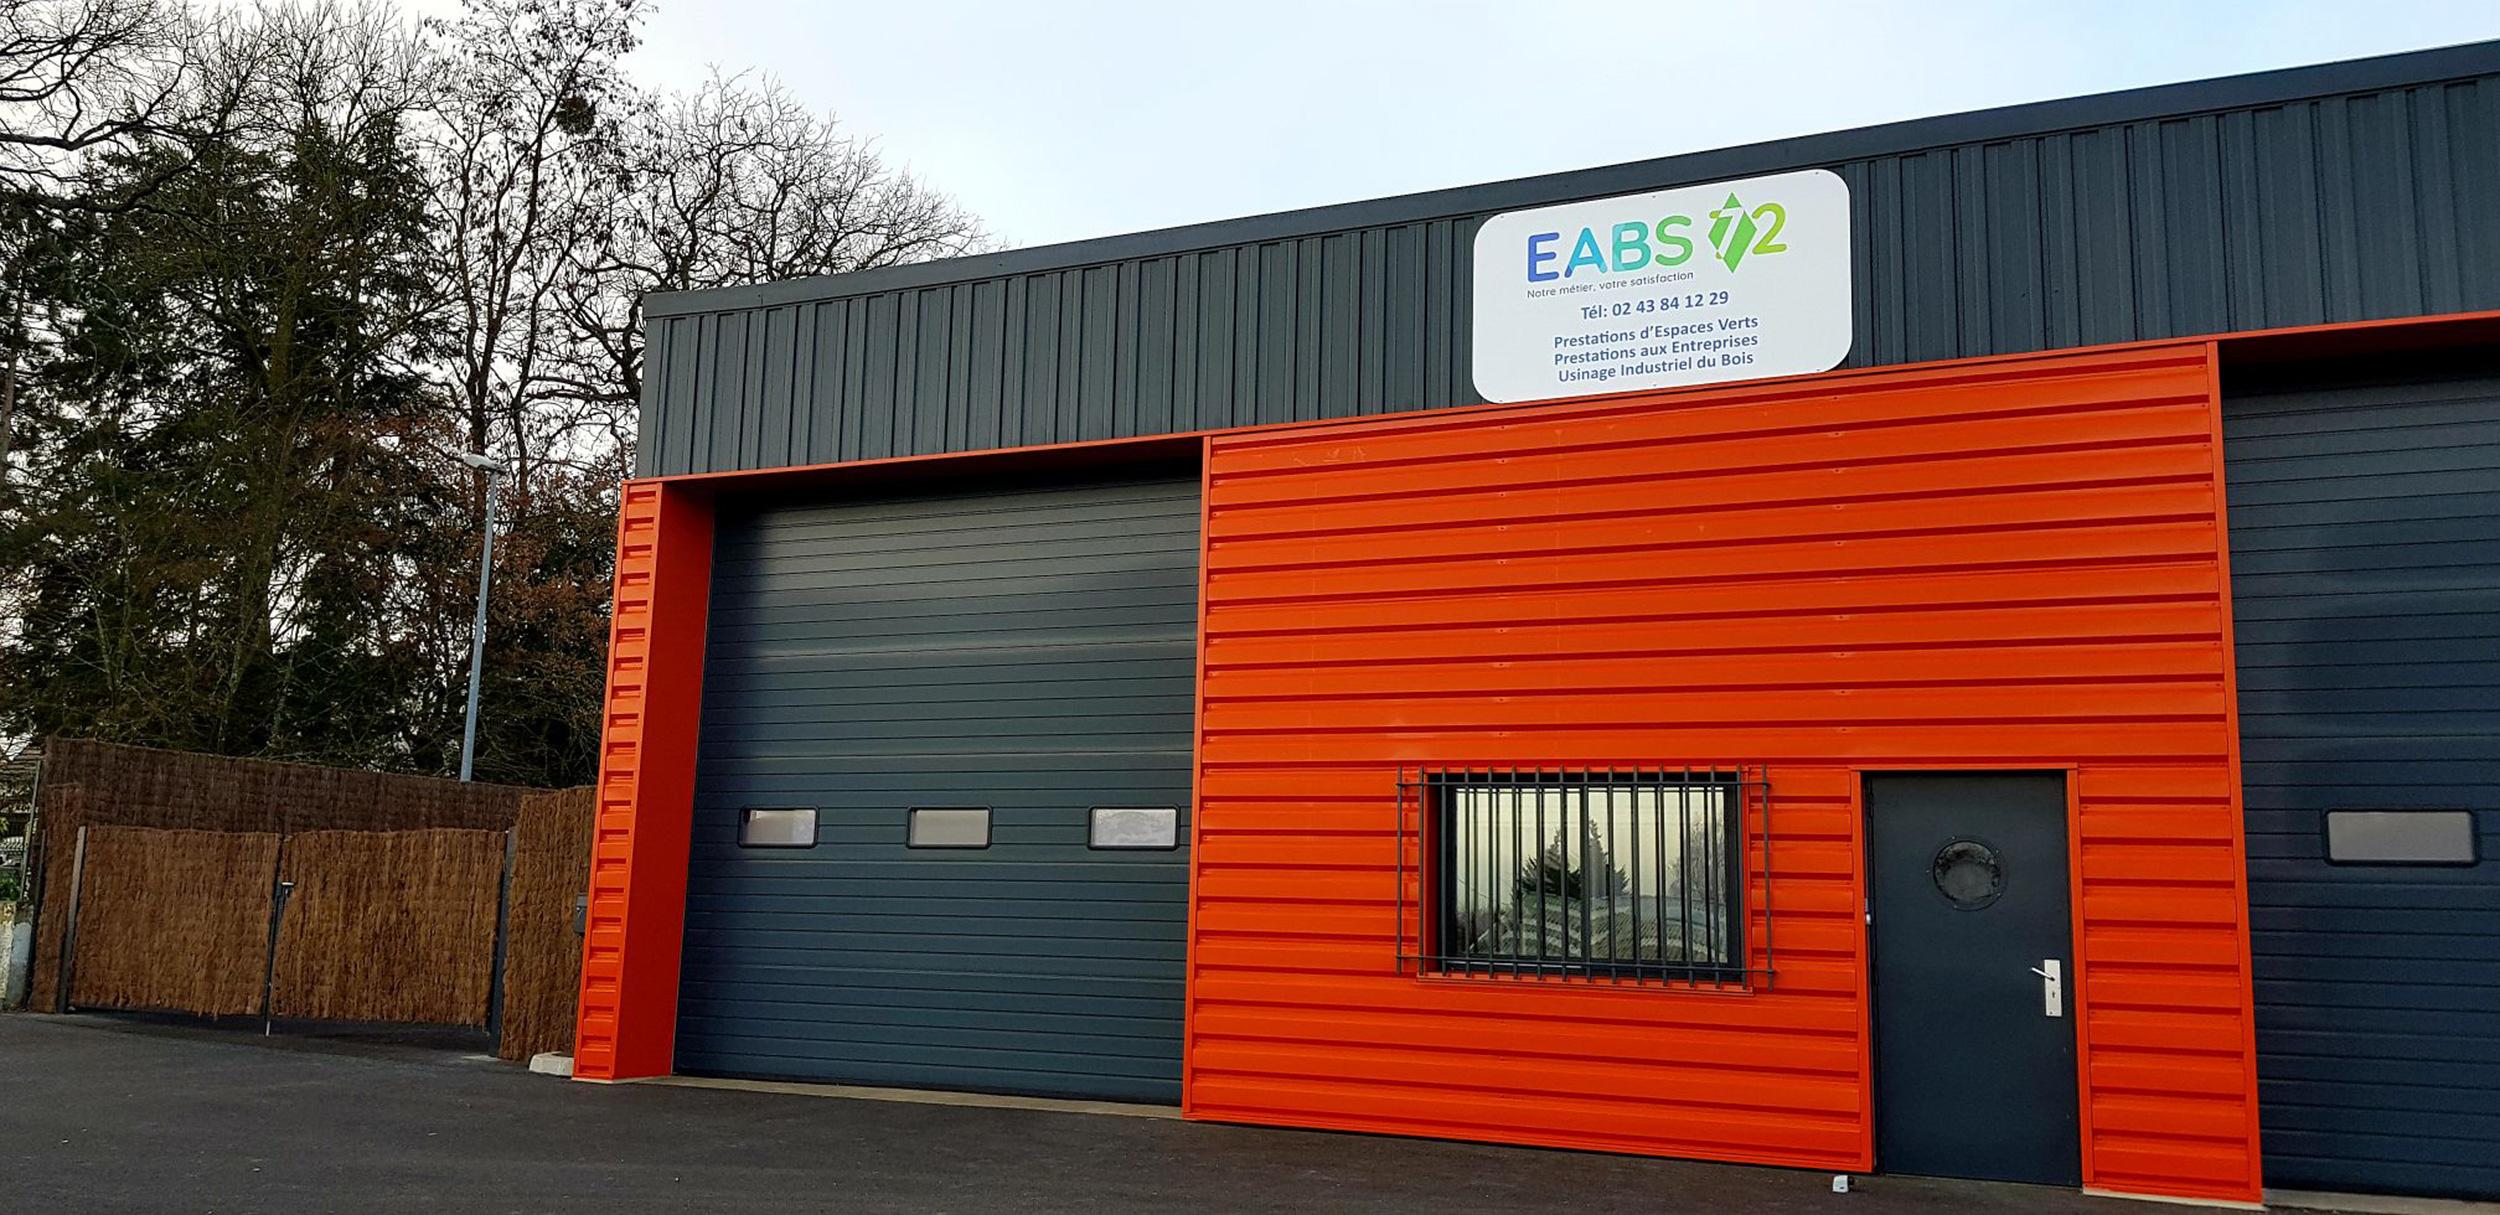 EABS72_Entreprise adaptee_La Ferte Bernard